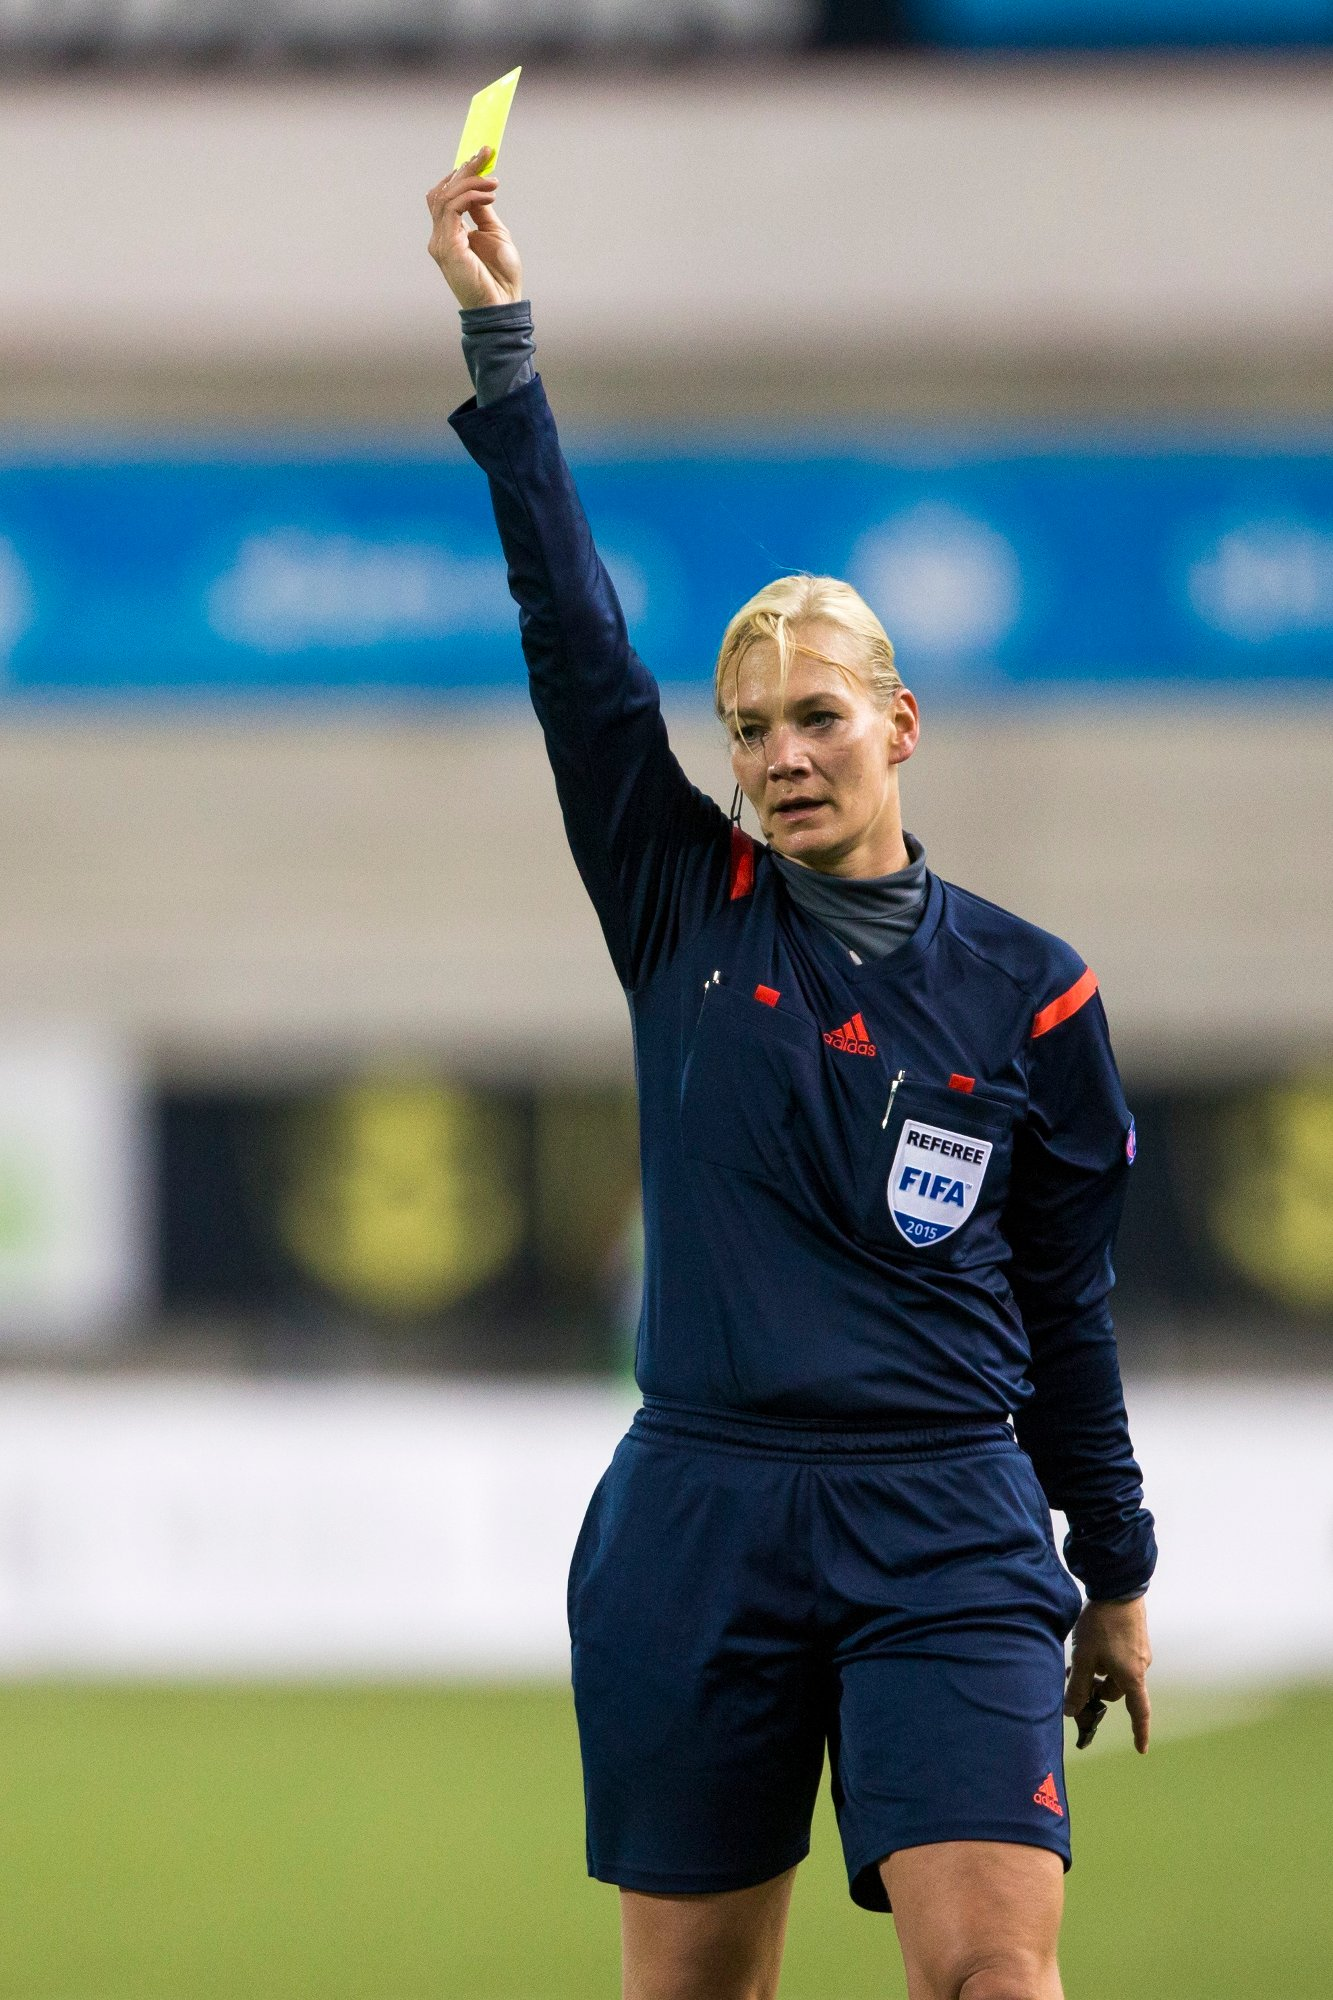 Bibiana Steinhaus dømmer VM-kampen mellom Frankrike og Norge onsdag. Foto: Svein Ove Ekornesvåg / NTB scanpix